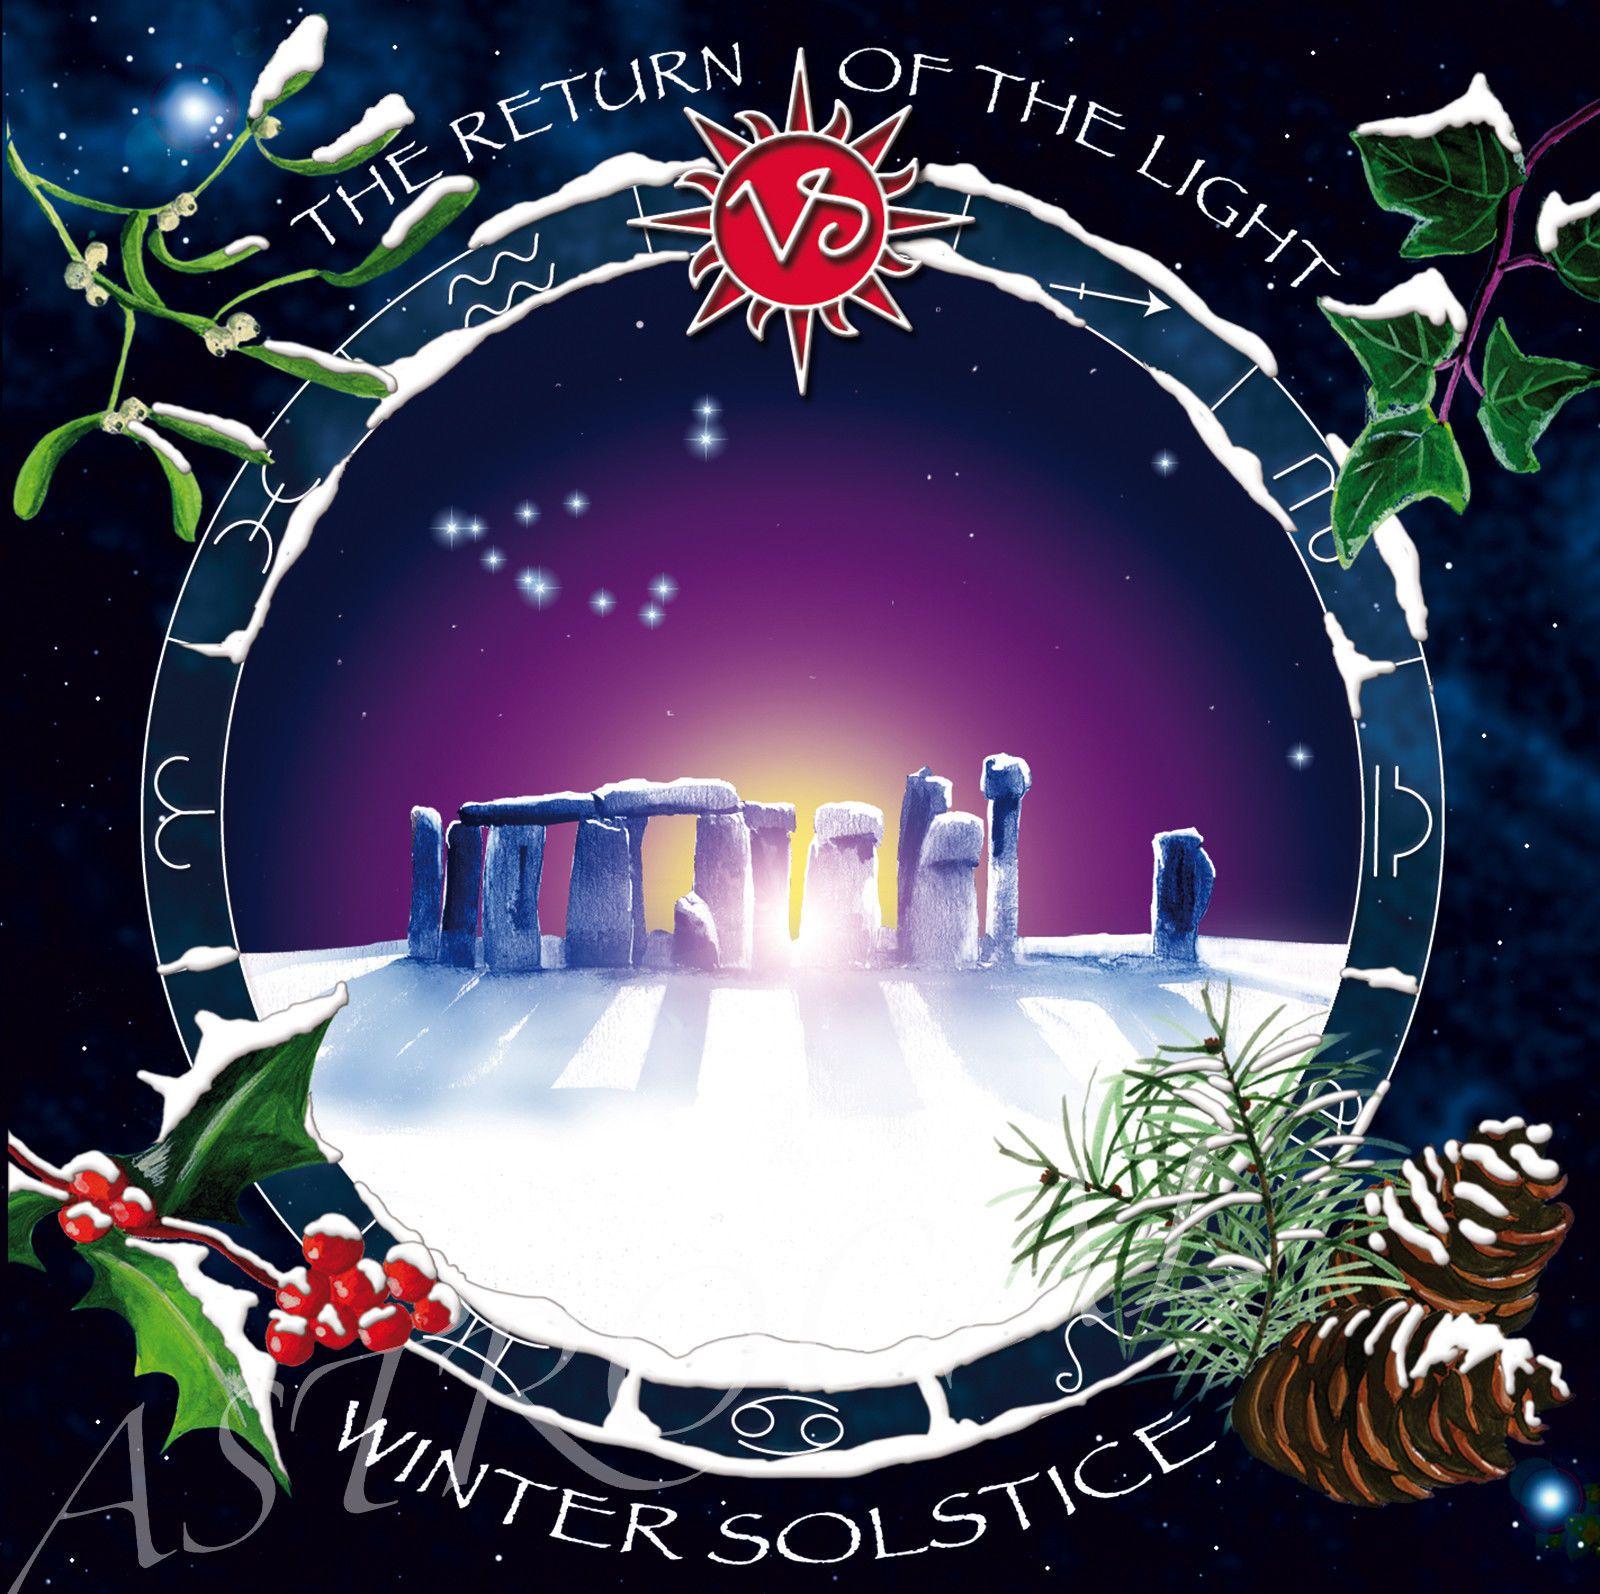 Winter Solstice Yule Cards Set Of 5 Designs Druid Celtic Wicca